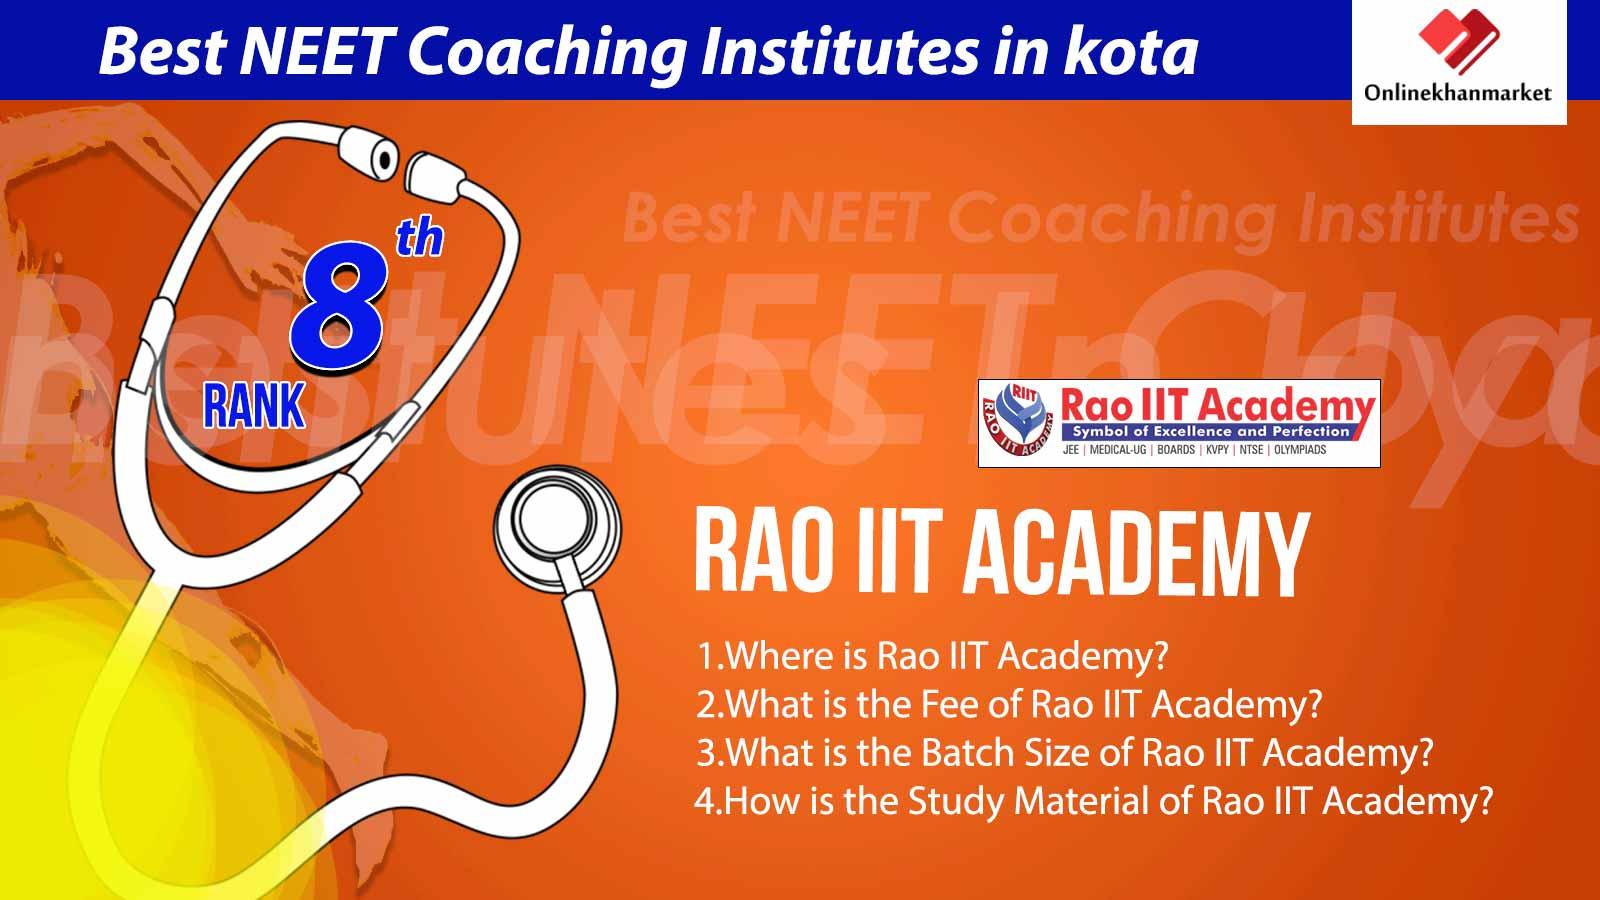 Top Neet Coaching of Kota